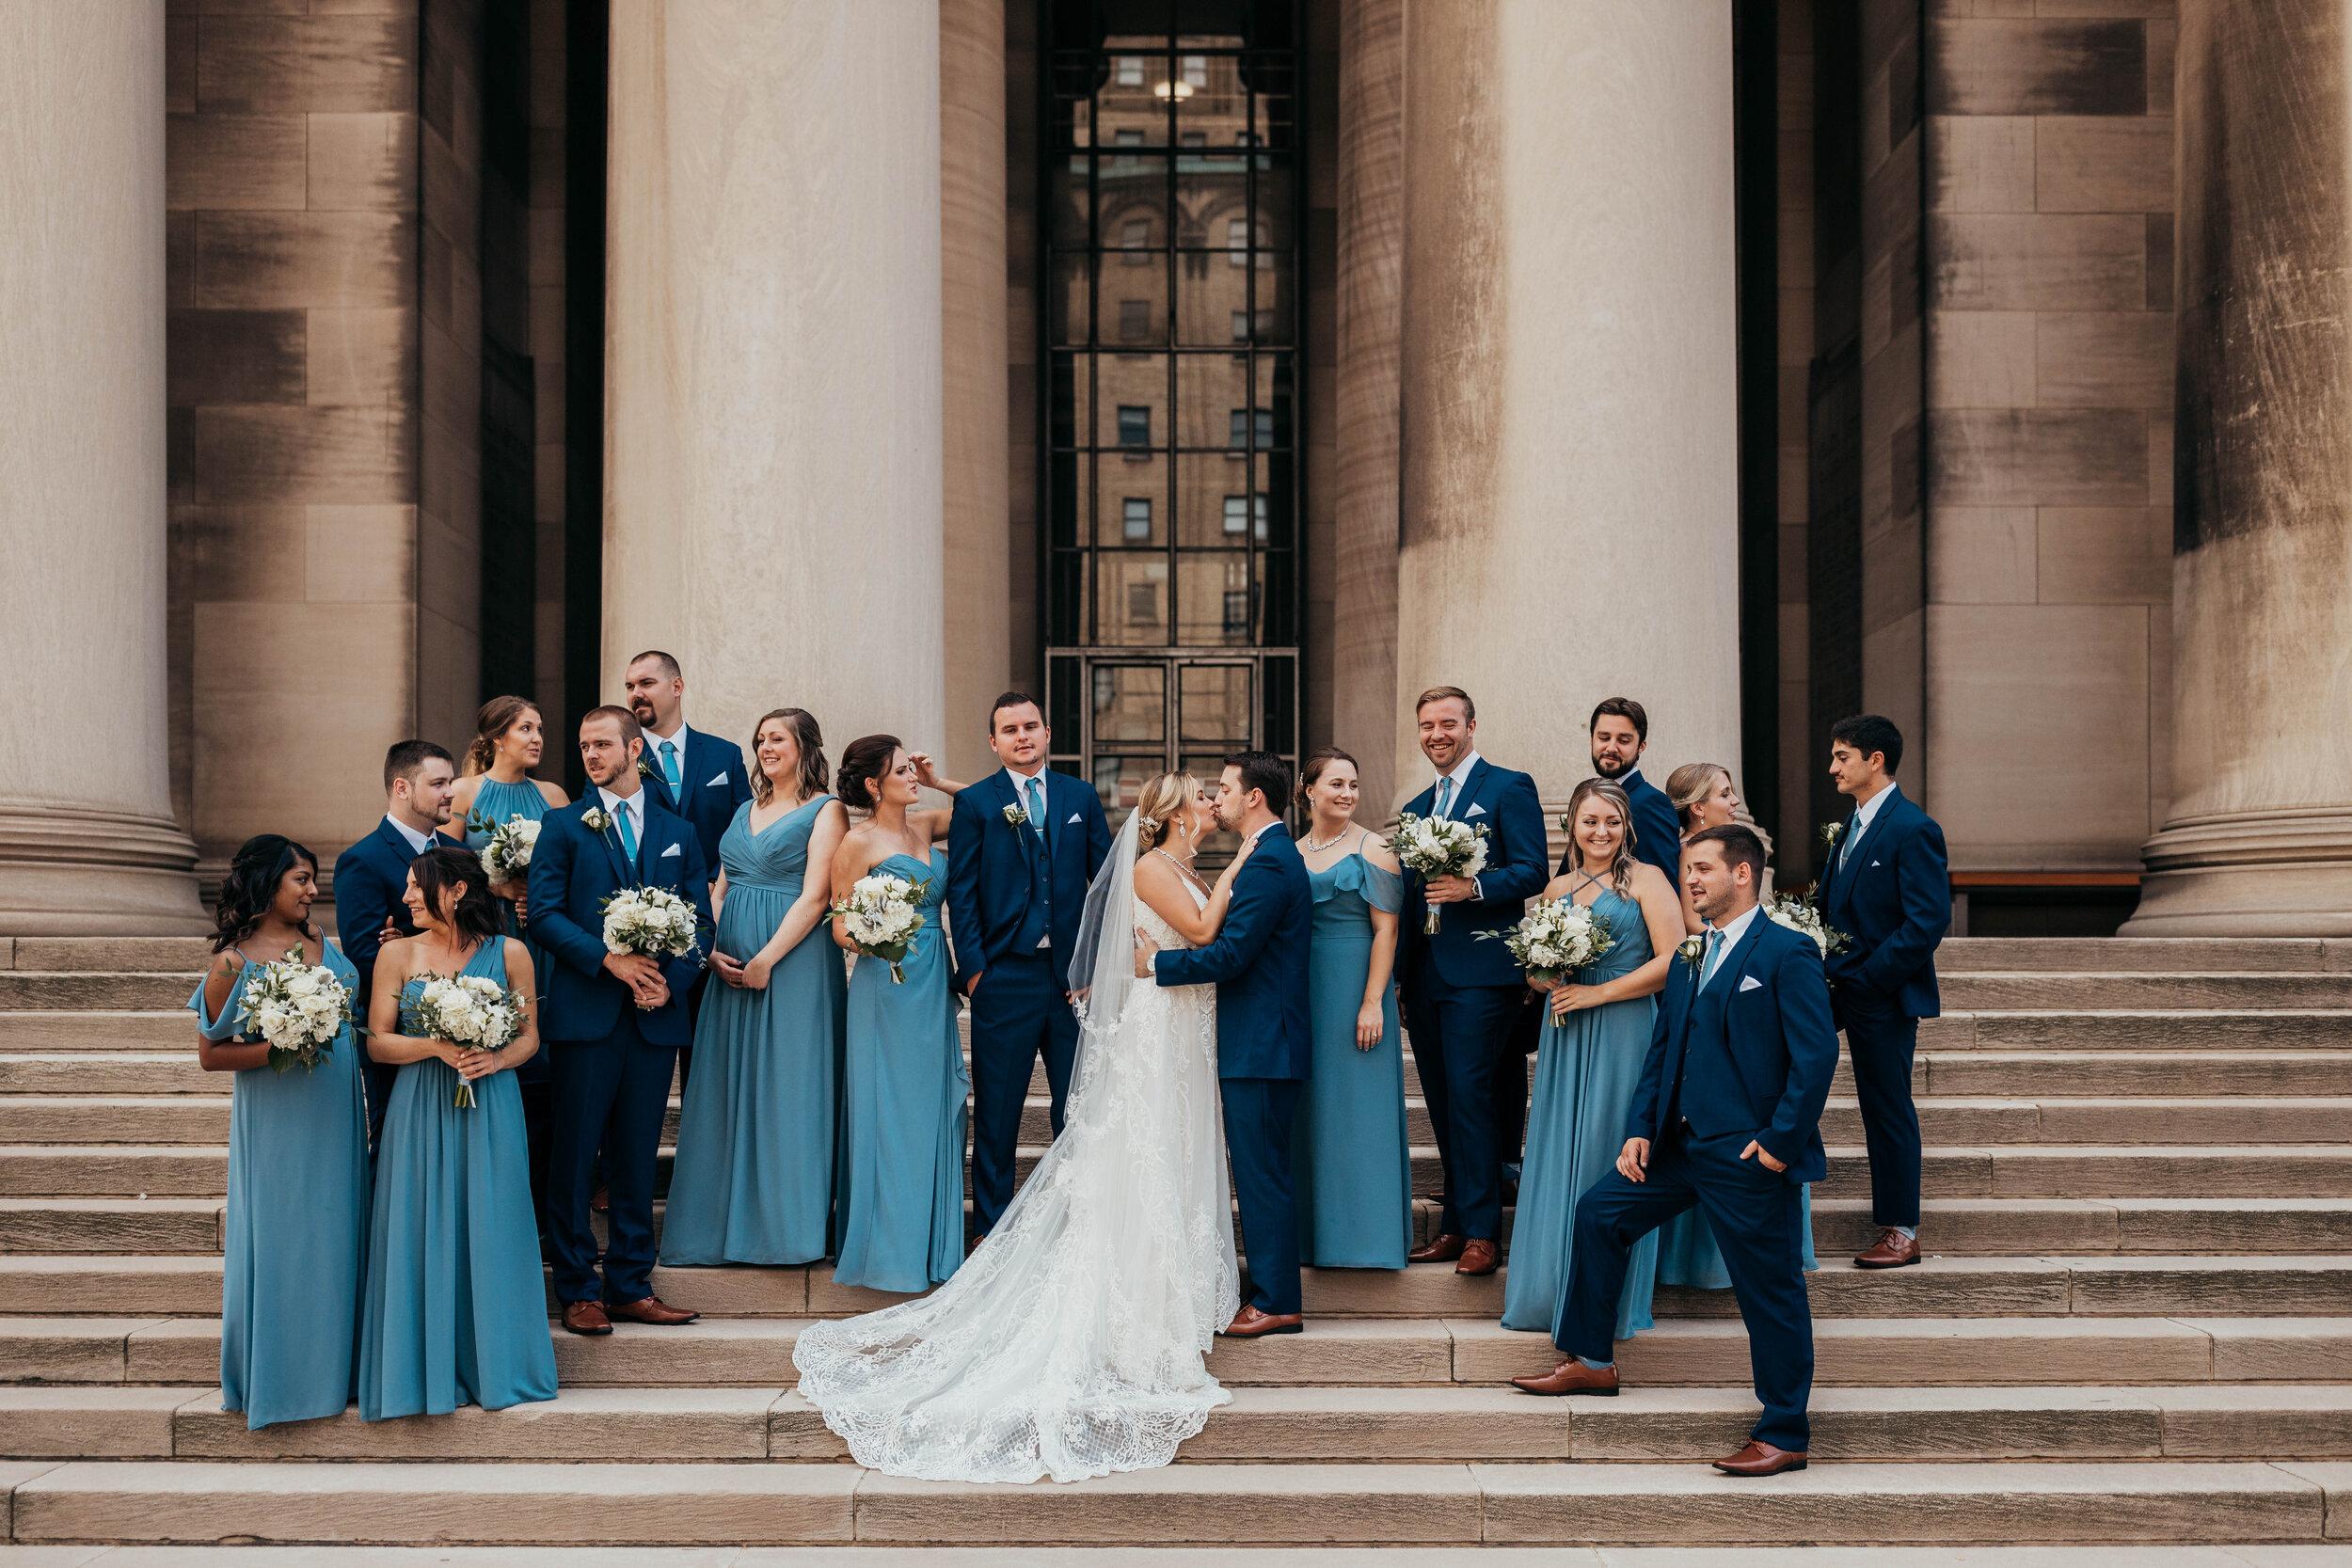 Pittsburgh wedding photography - Hartwood Acres Mansion wedding-348.jpg